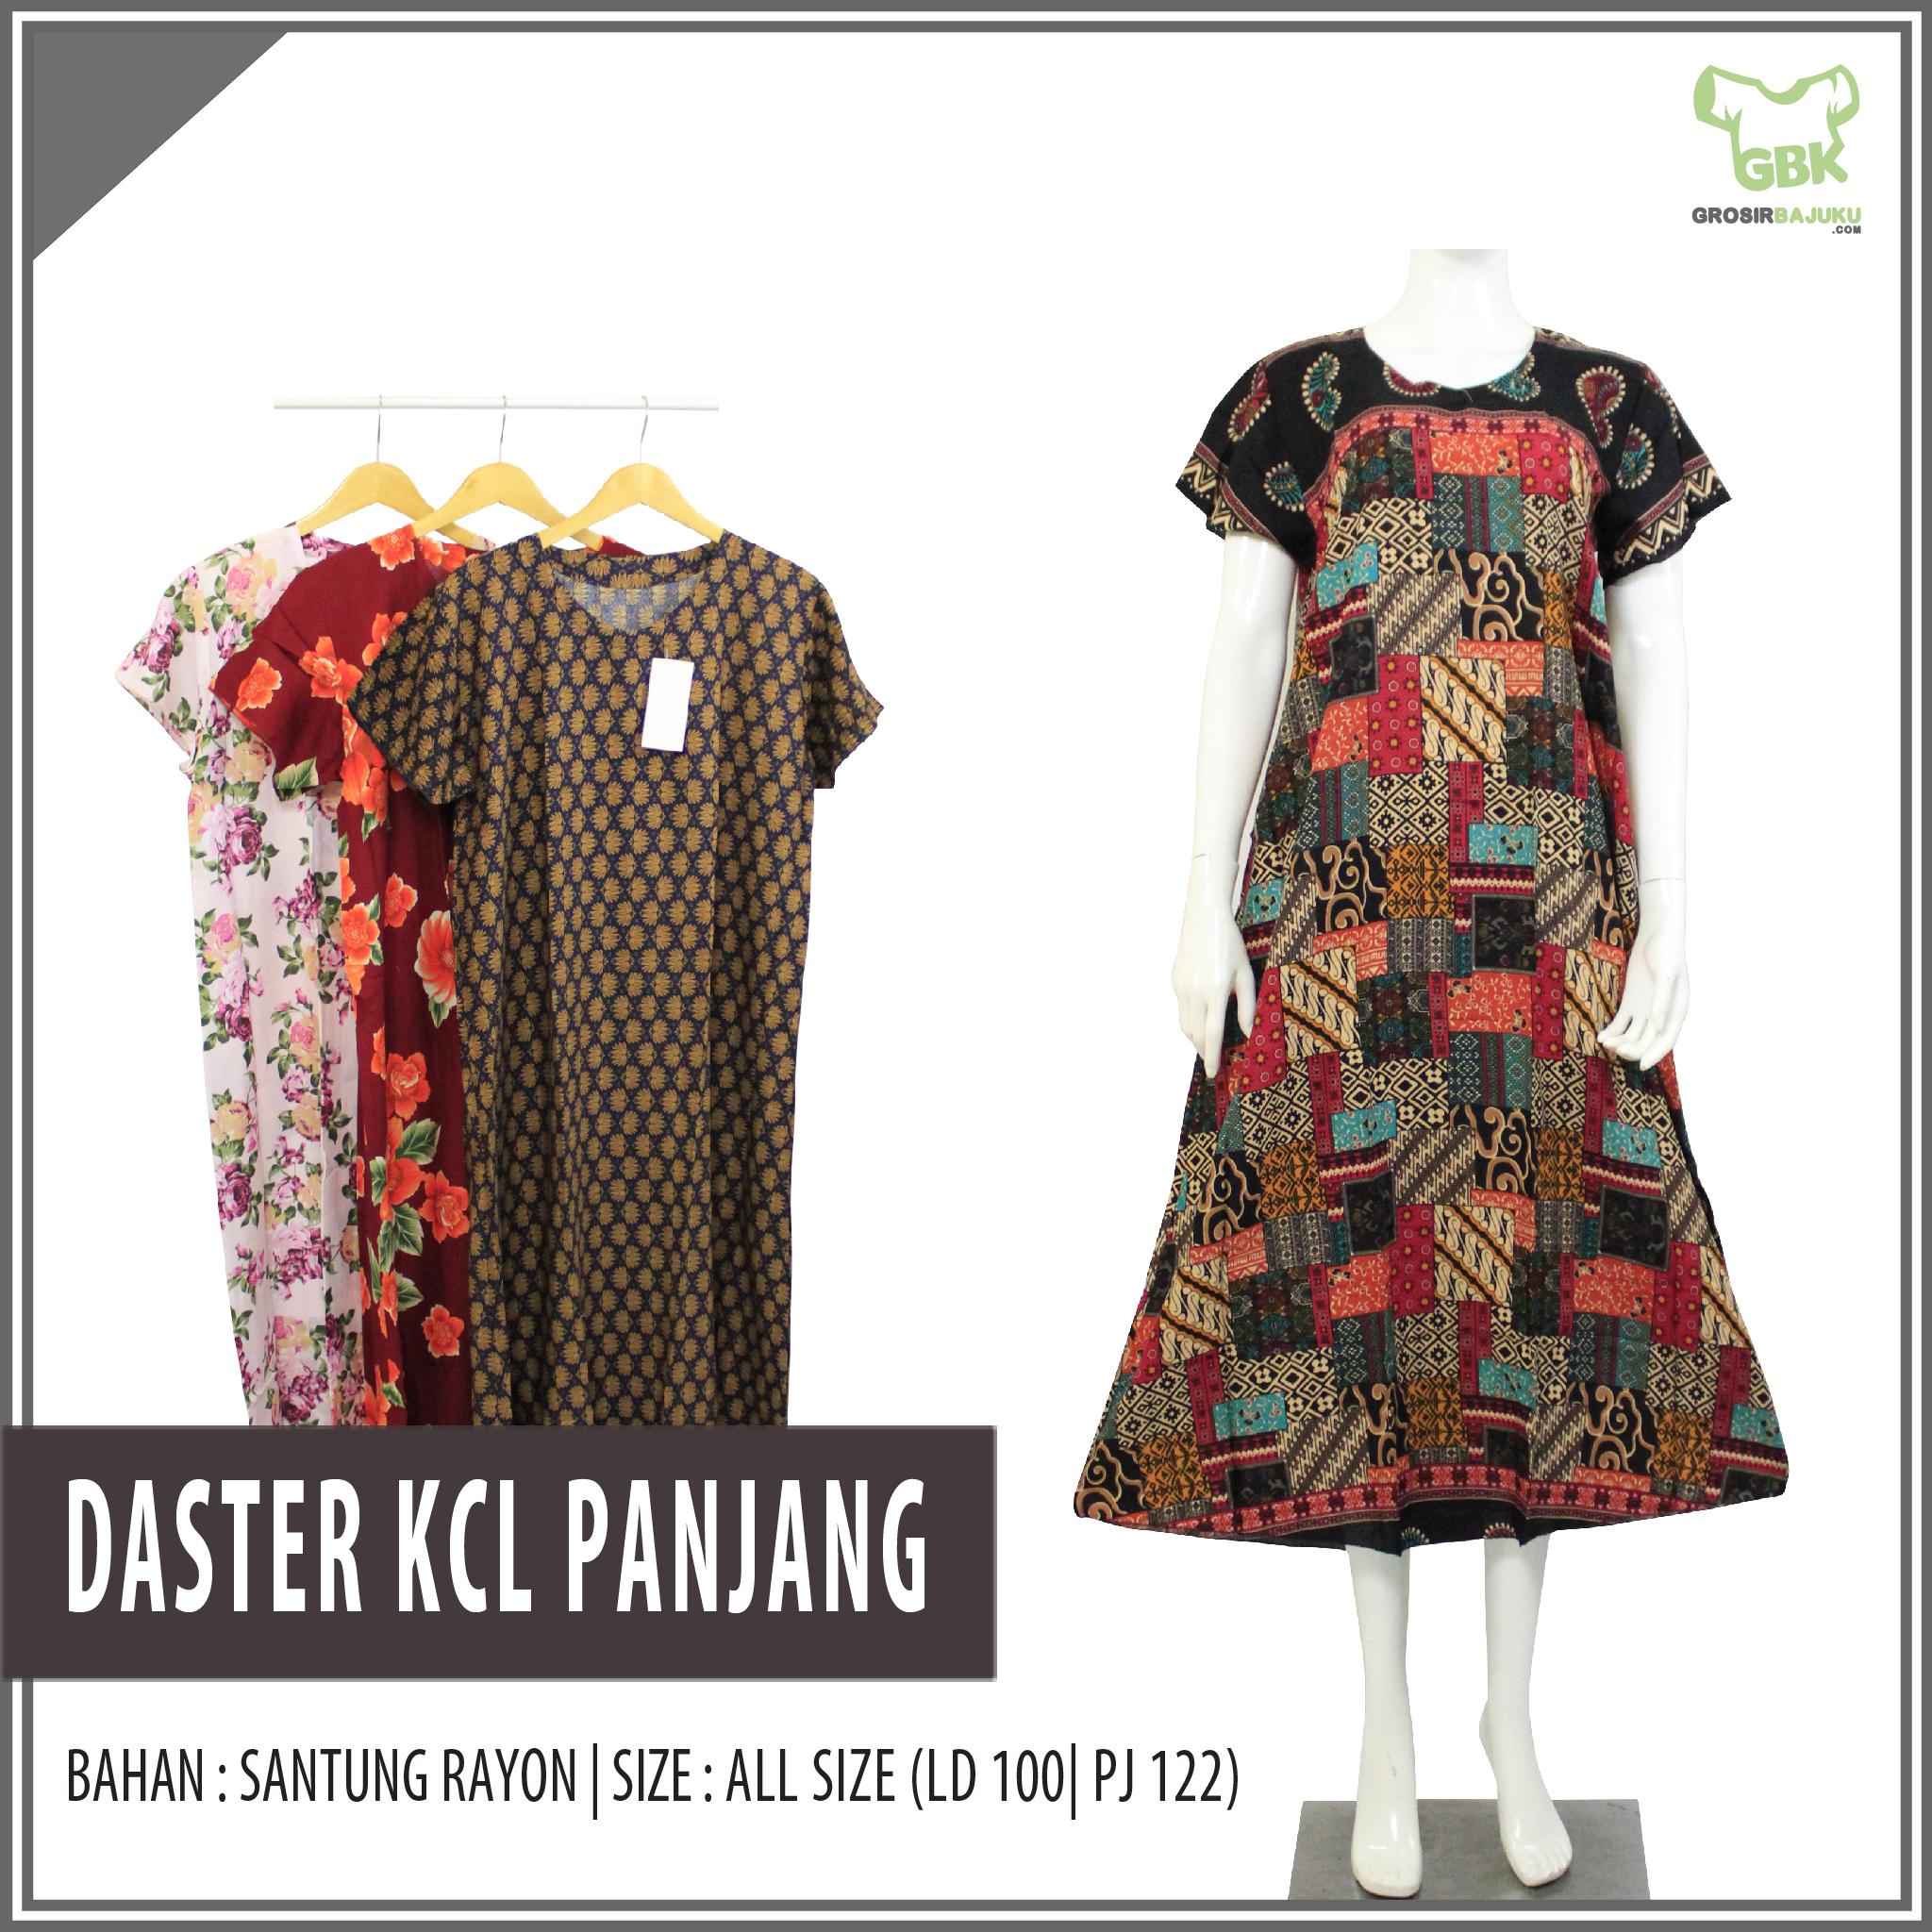 Daster KCL Panjang